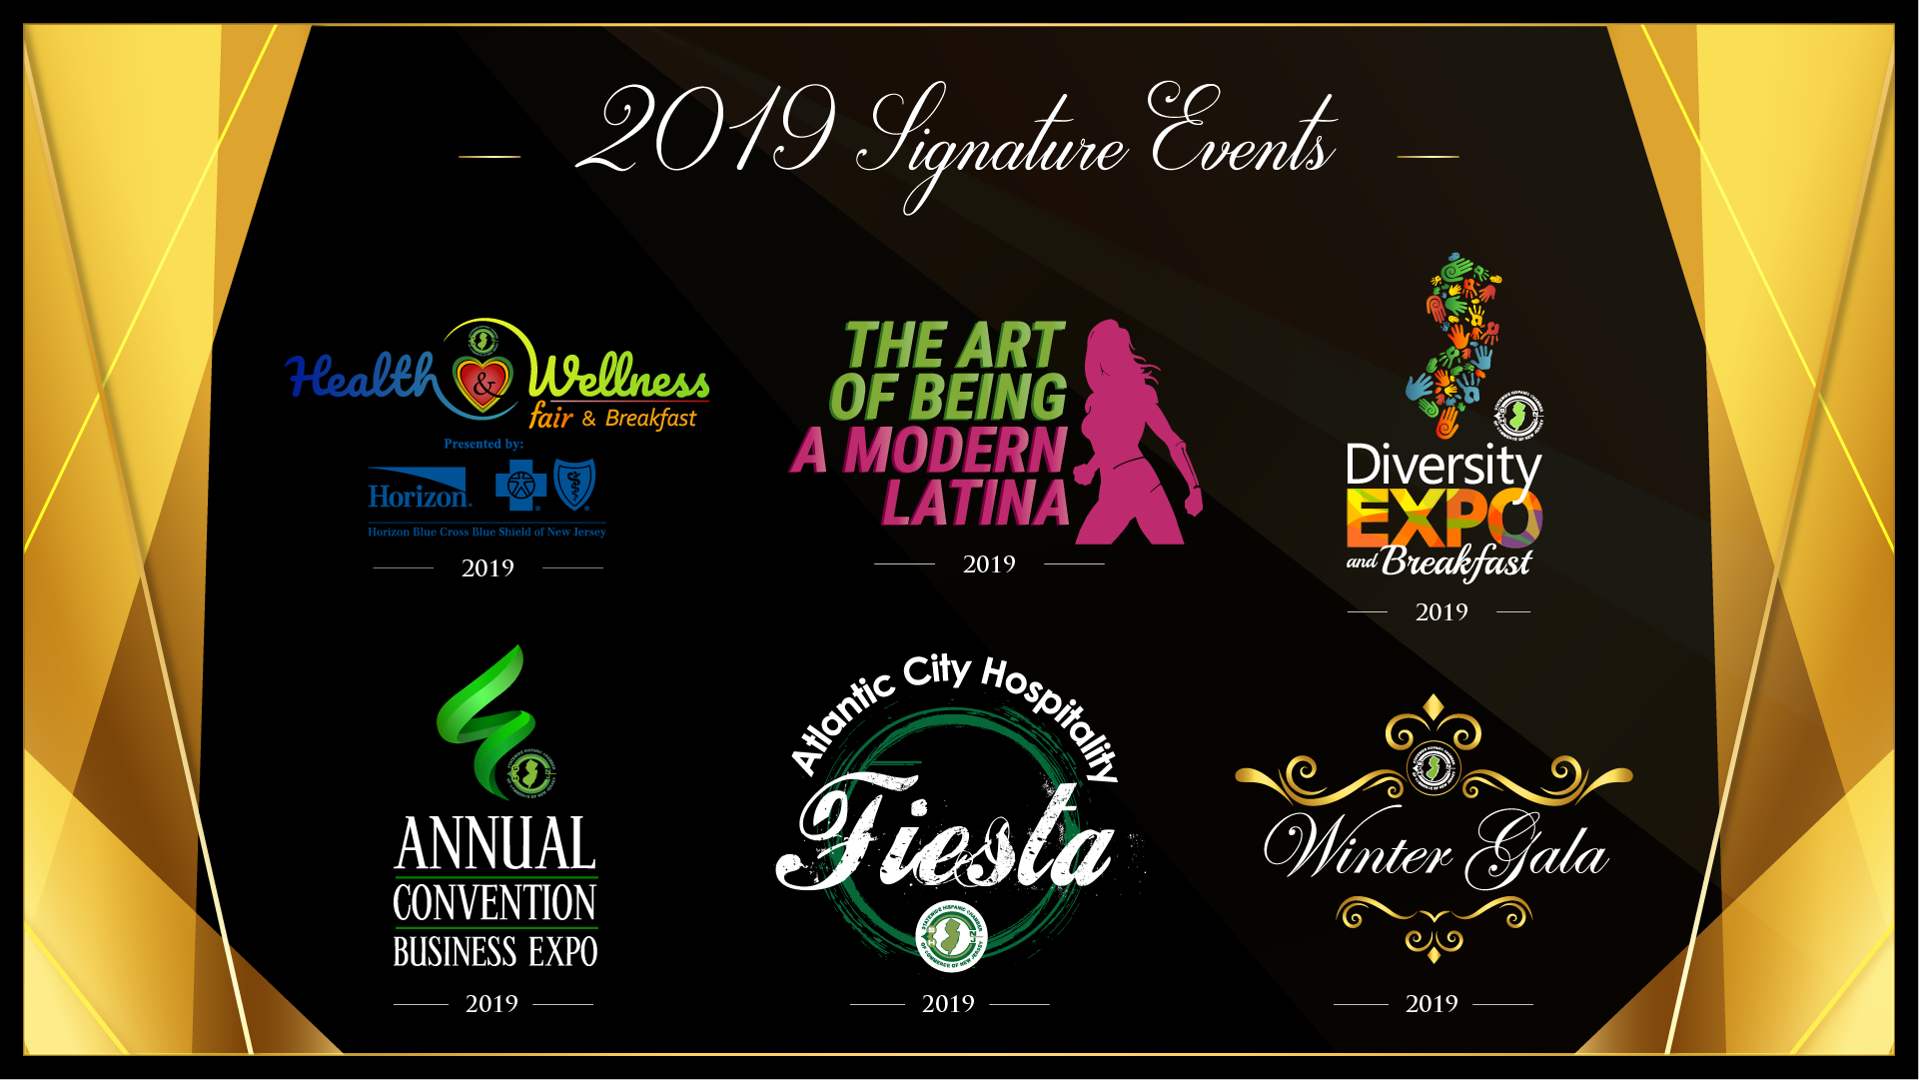 2019 SHCCNJ Events | SHCCNJ – Statewide Hispanic Chamber of